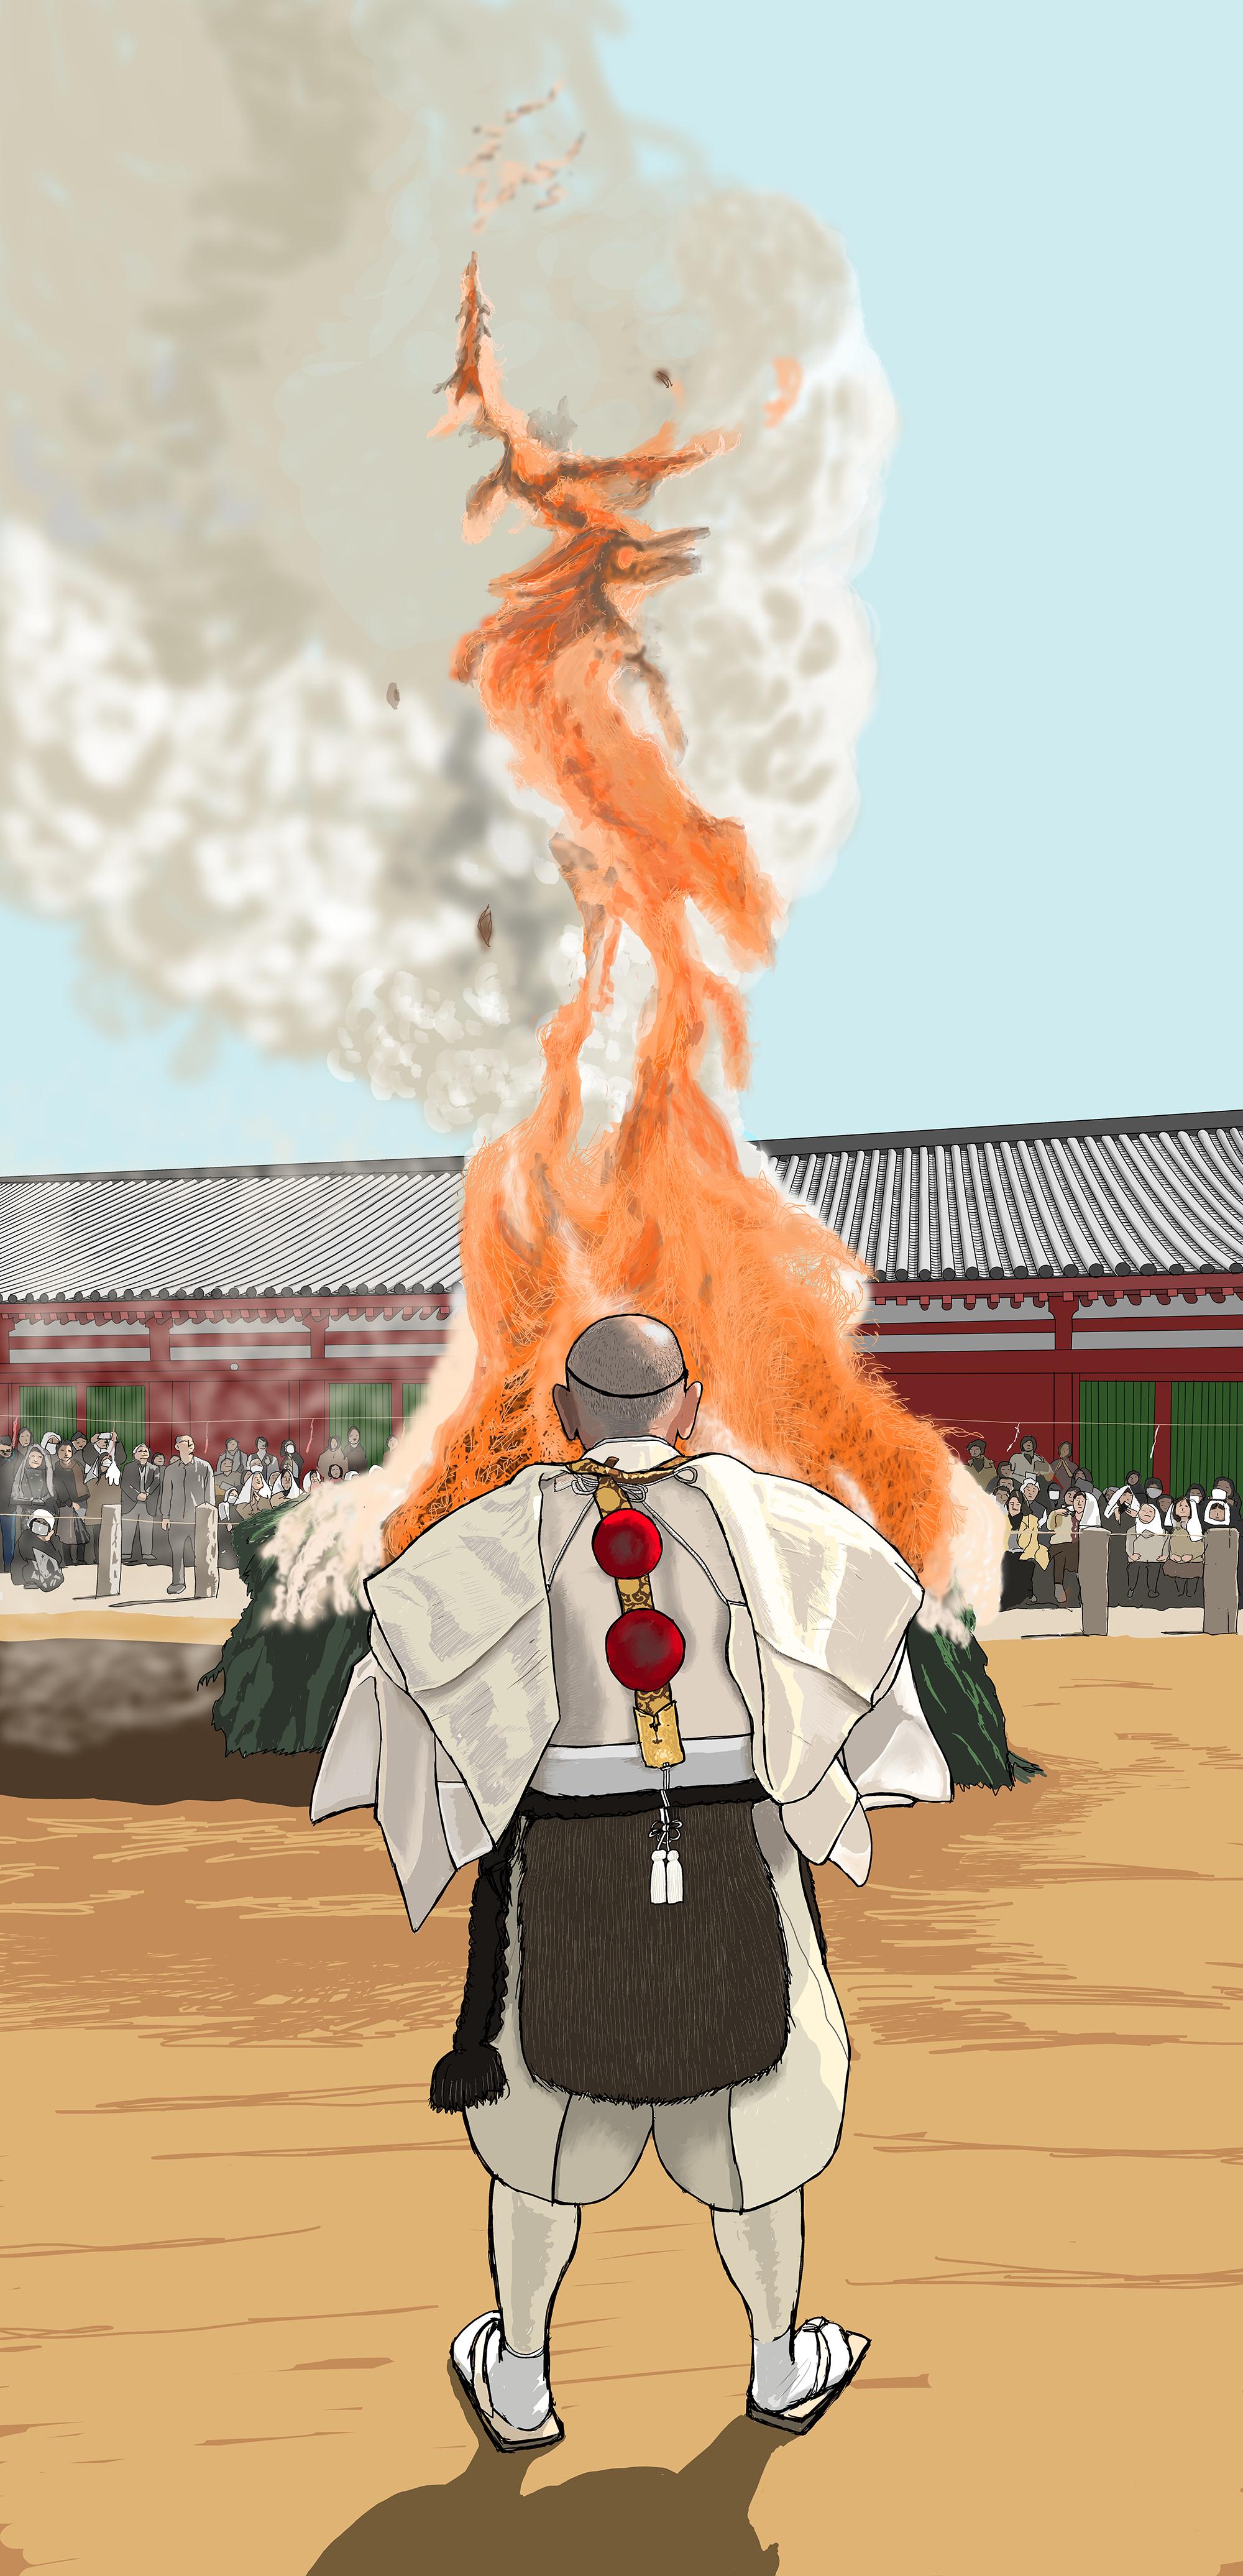 FIRE DRAGON(Nara Yakushiji Otakiage)